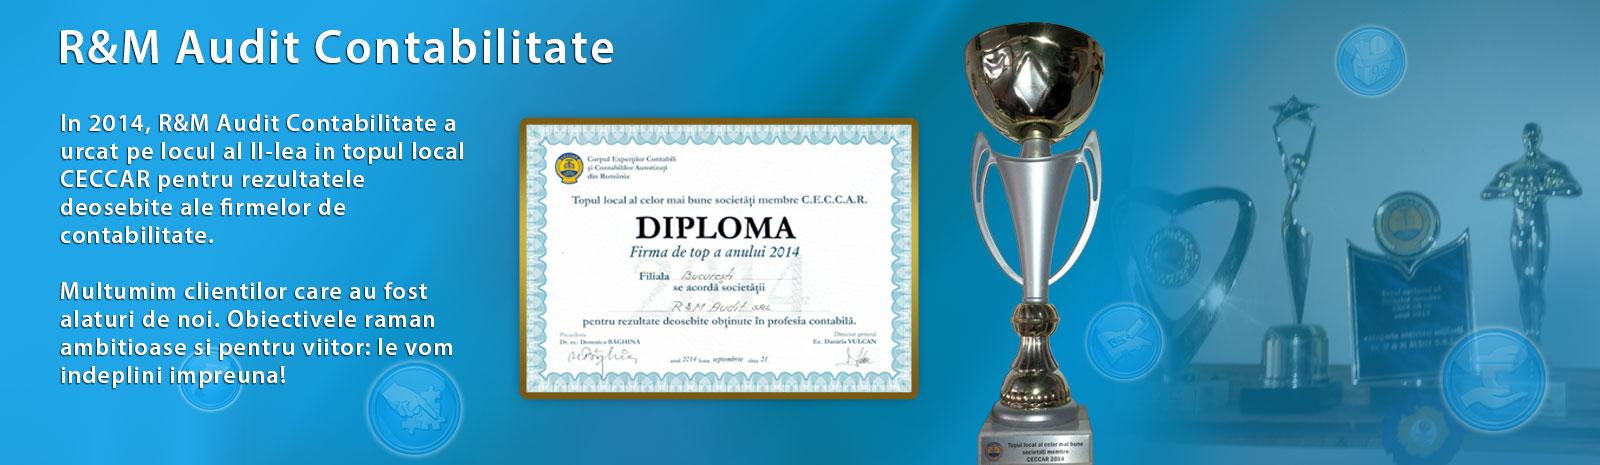 banner-diploma